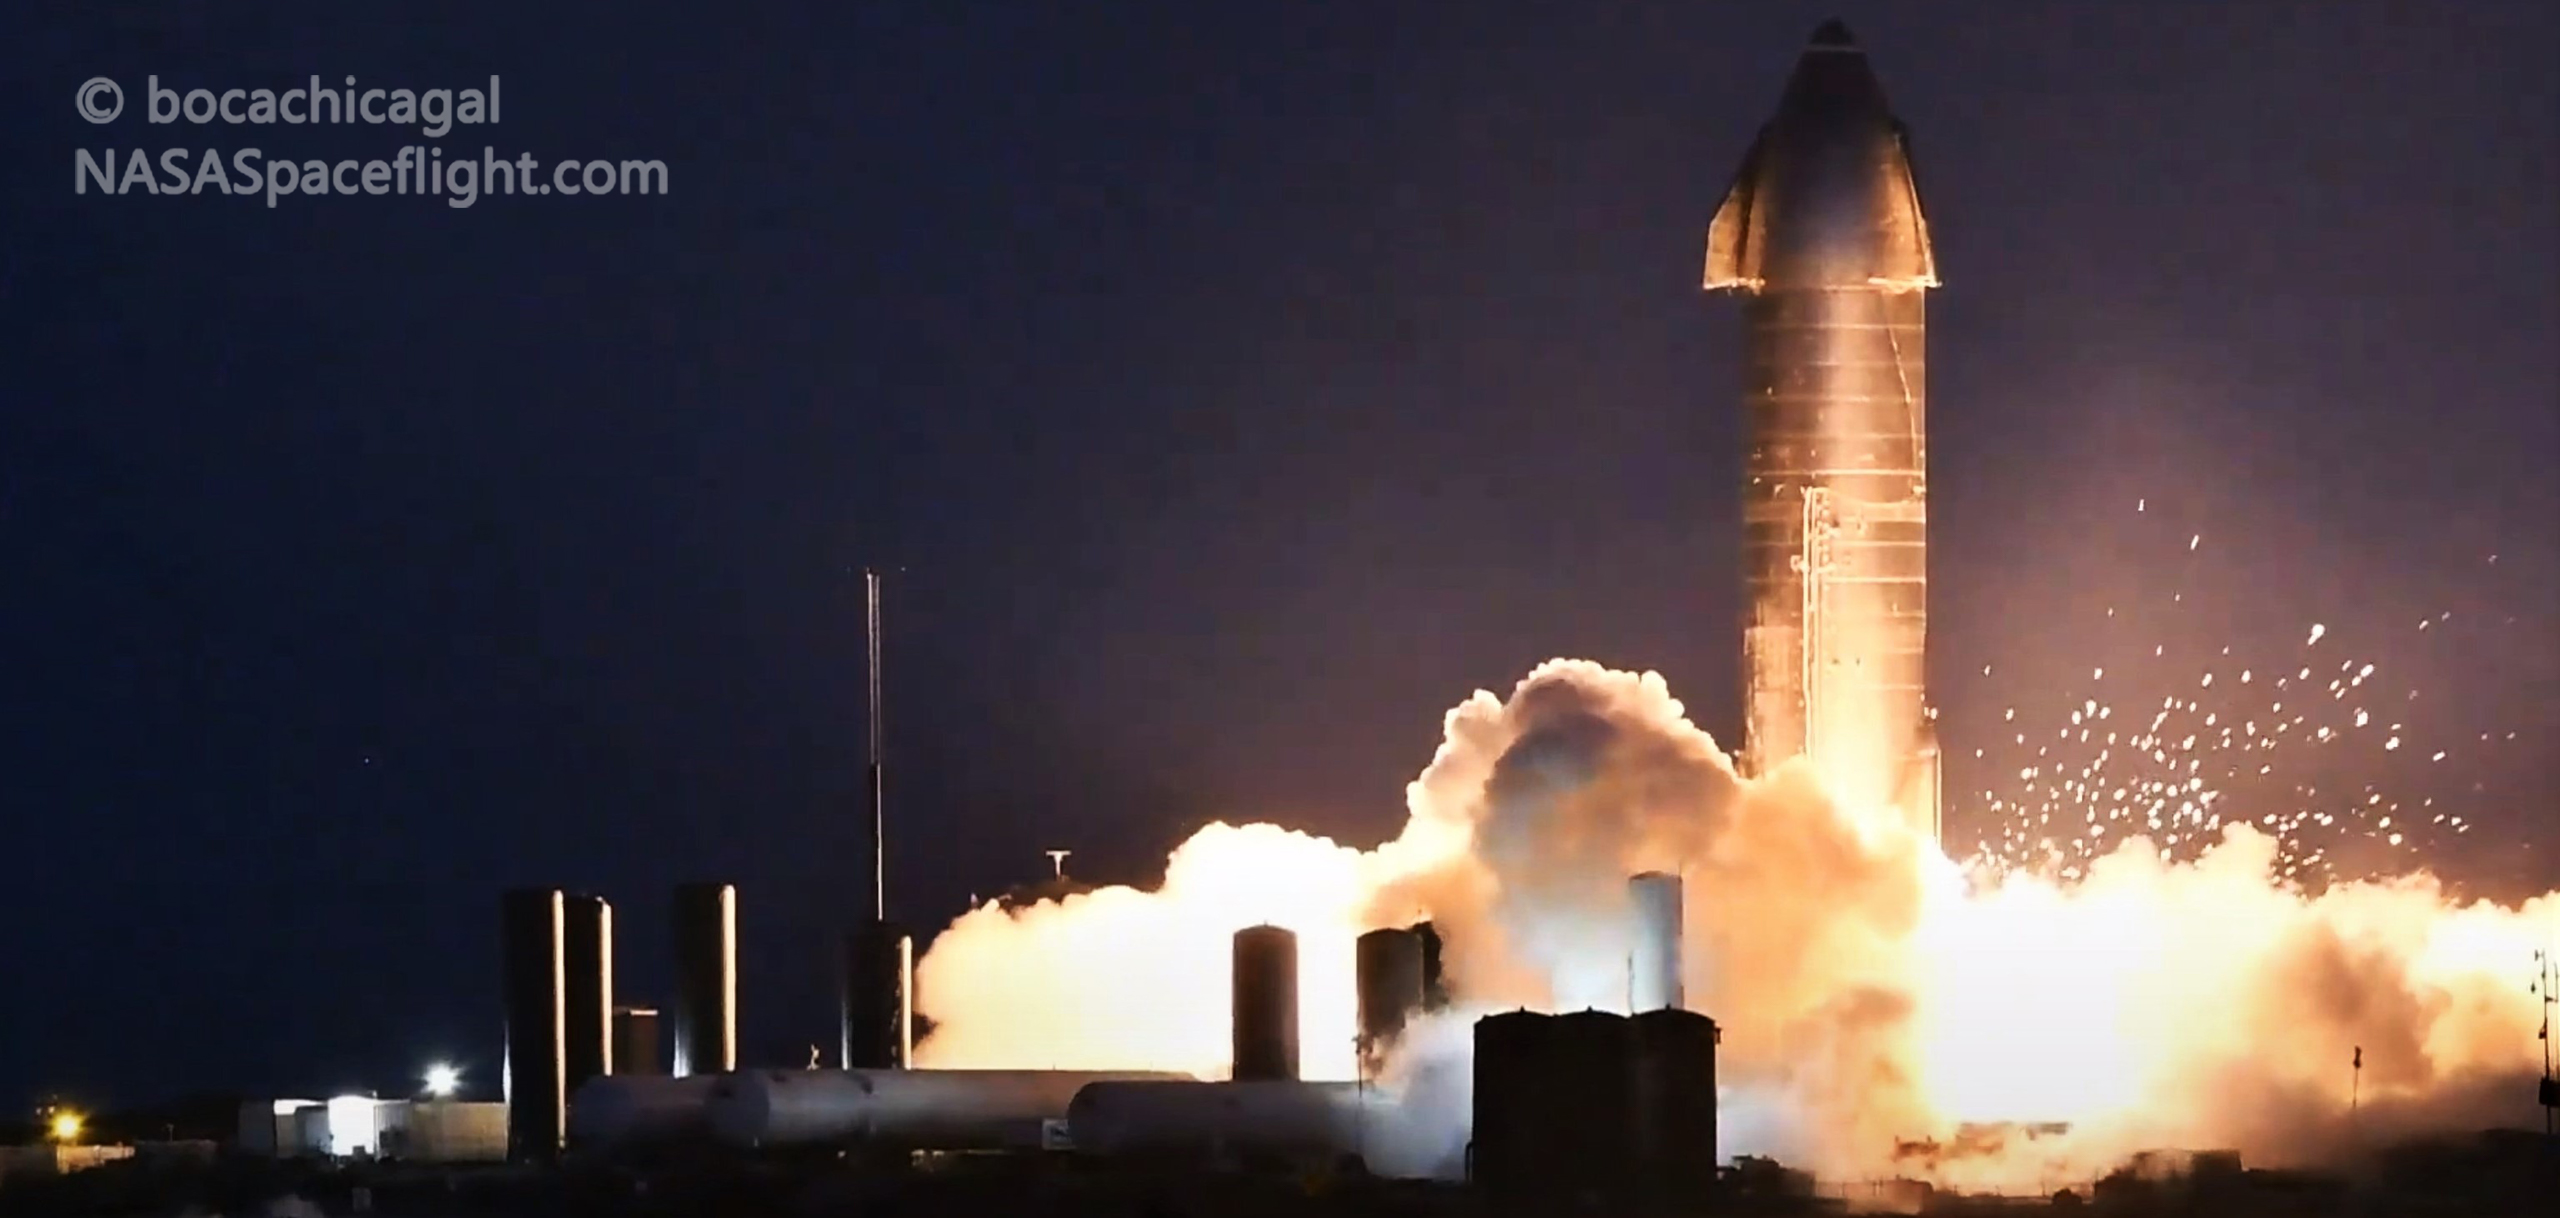 Starship Boca Chica 111020 (NASASpaceflight – bocachicagal) SN8 static fire #2 sparks 1